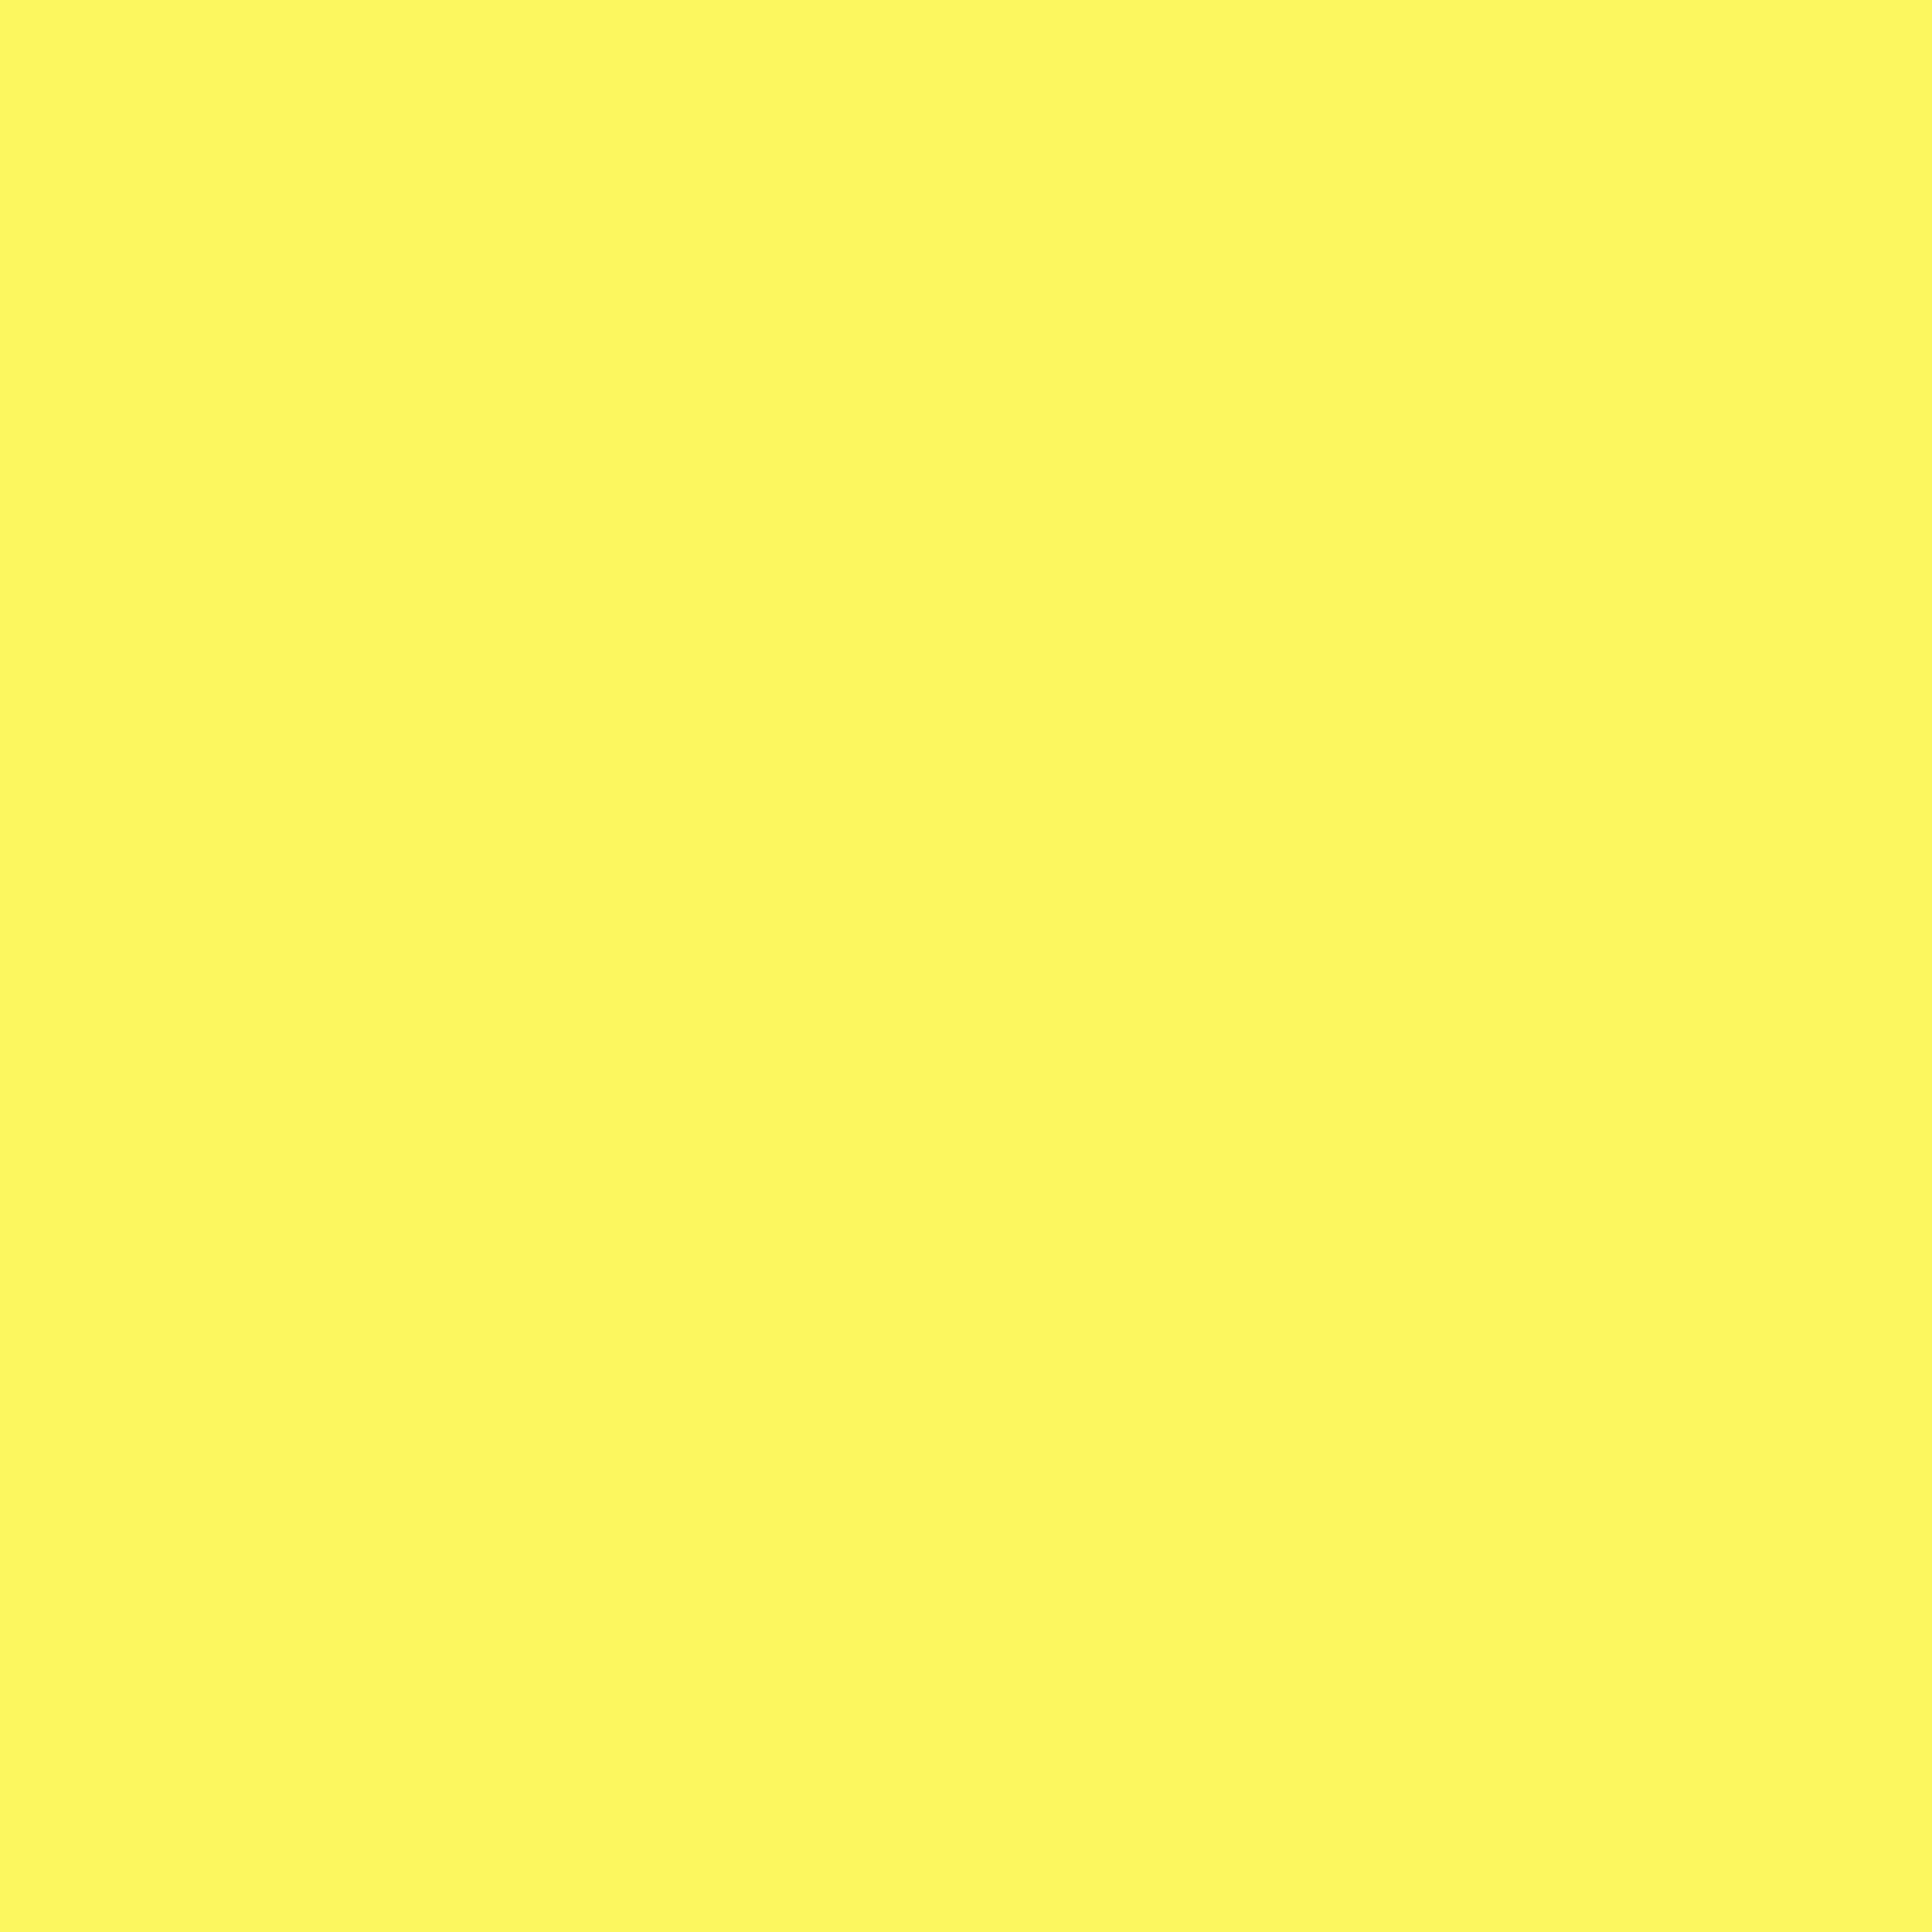 3600x3600 Icterine Solid Color Background